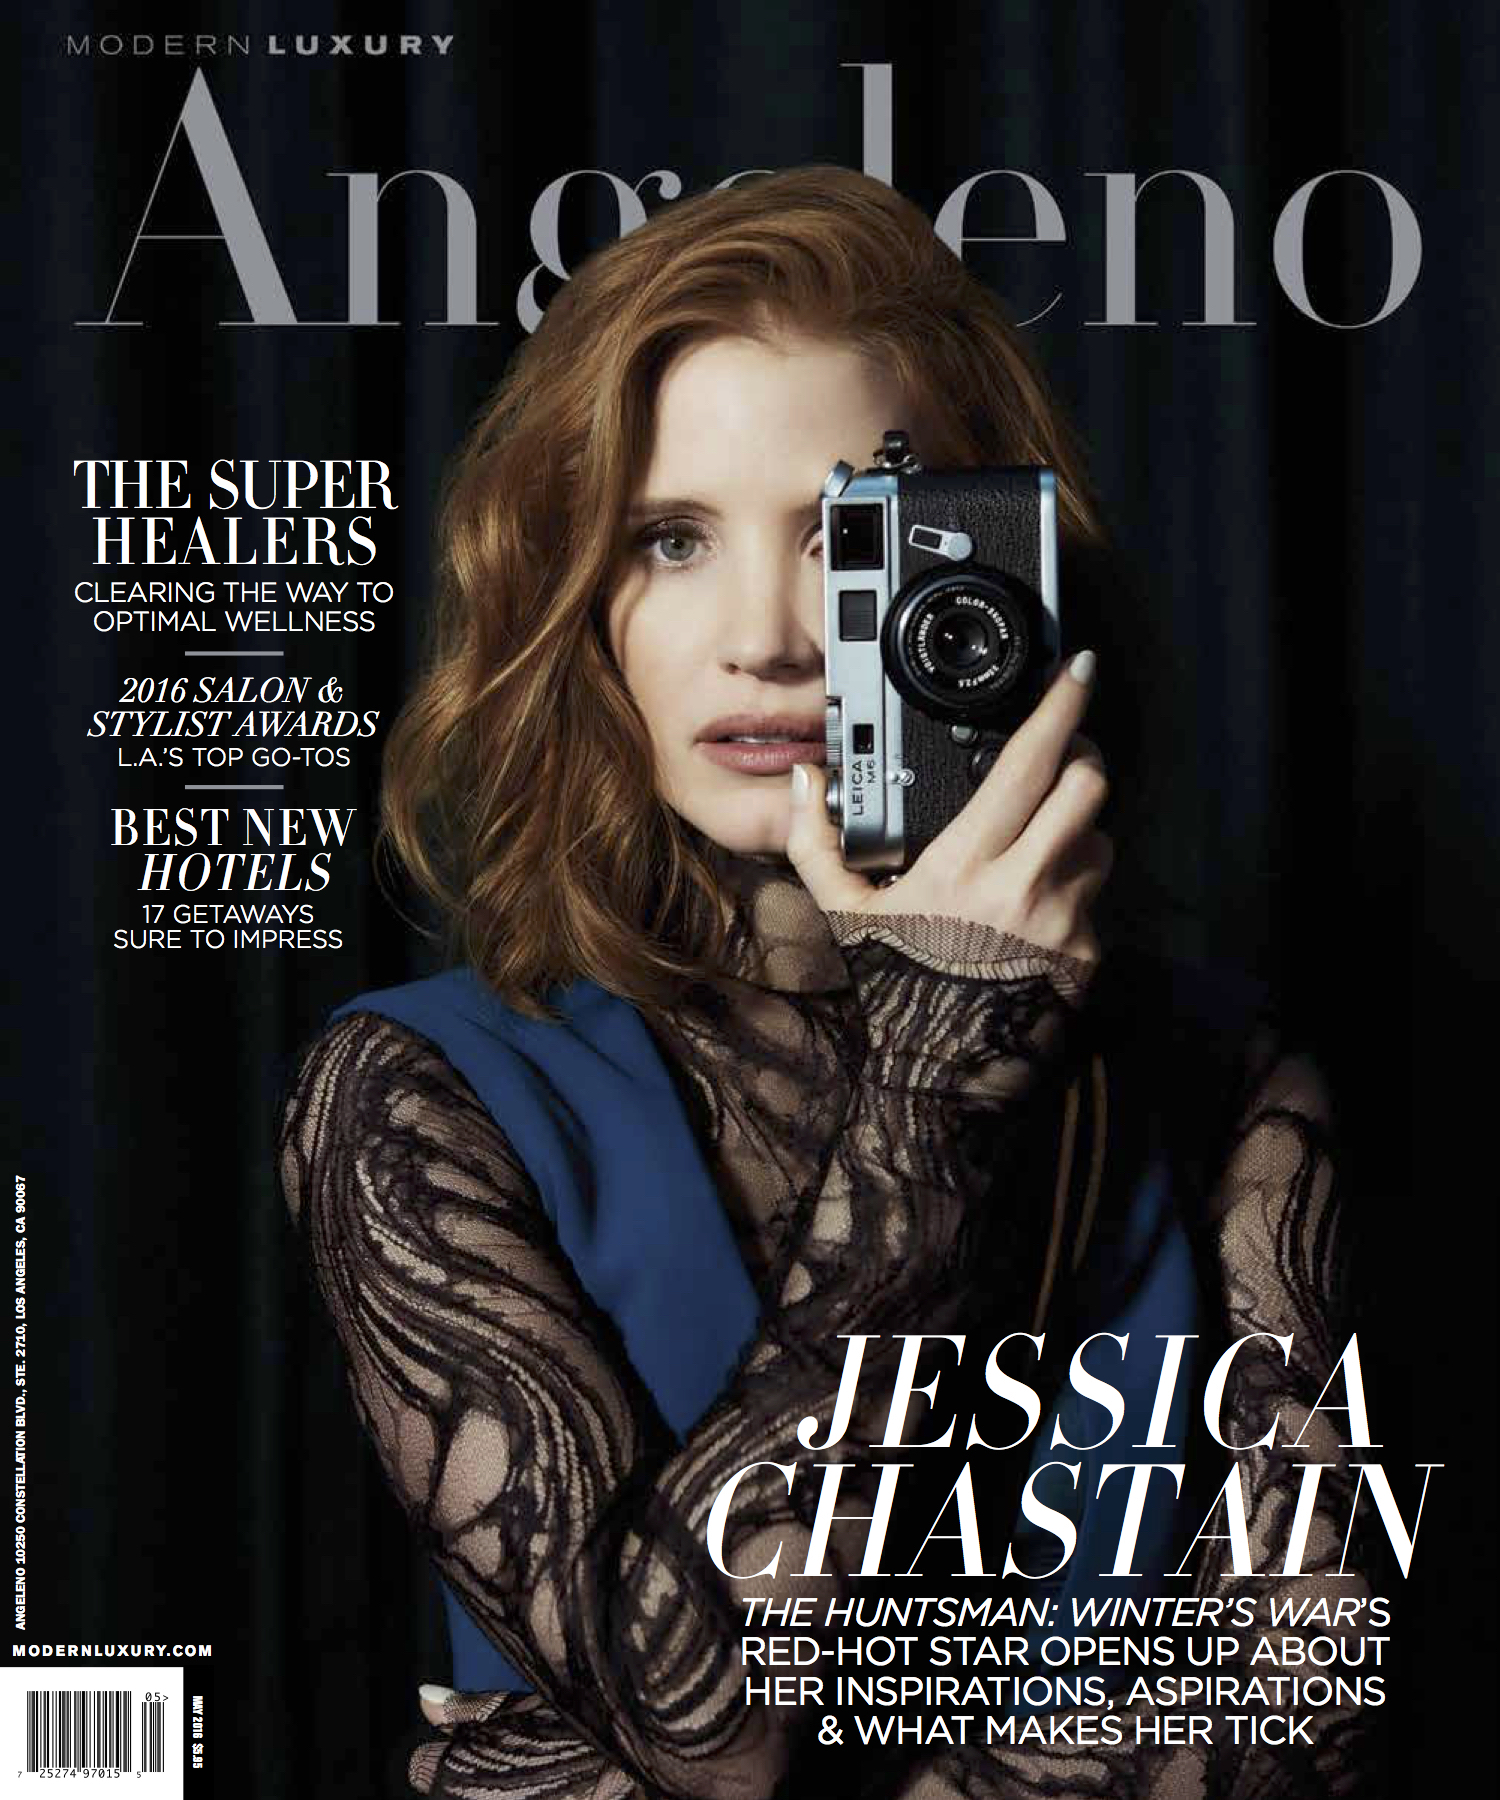 ANGELENO-Cover-May-2017jpg.jpg